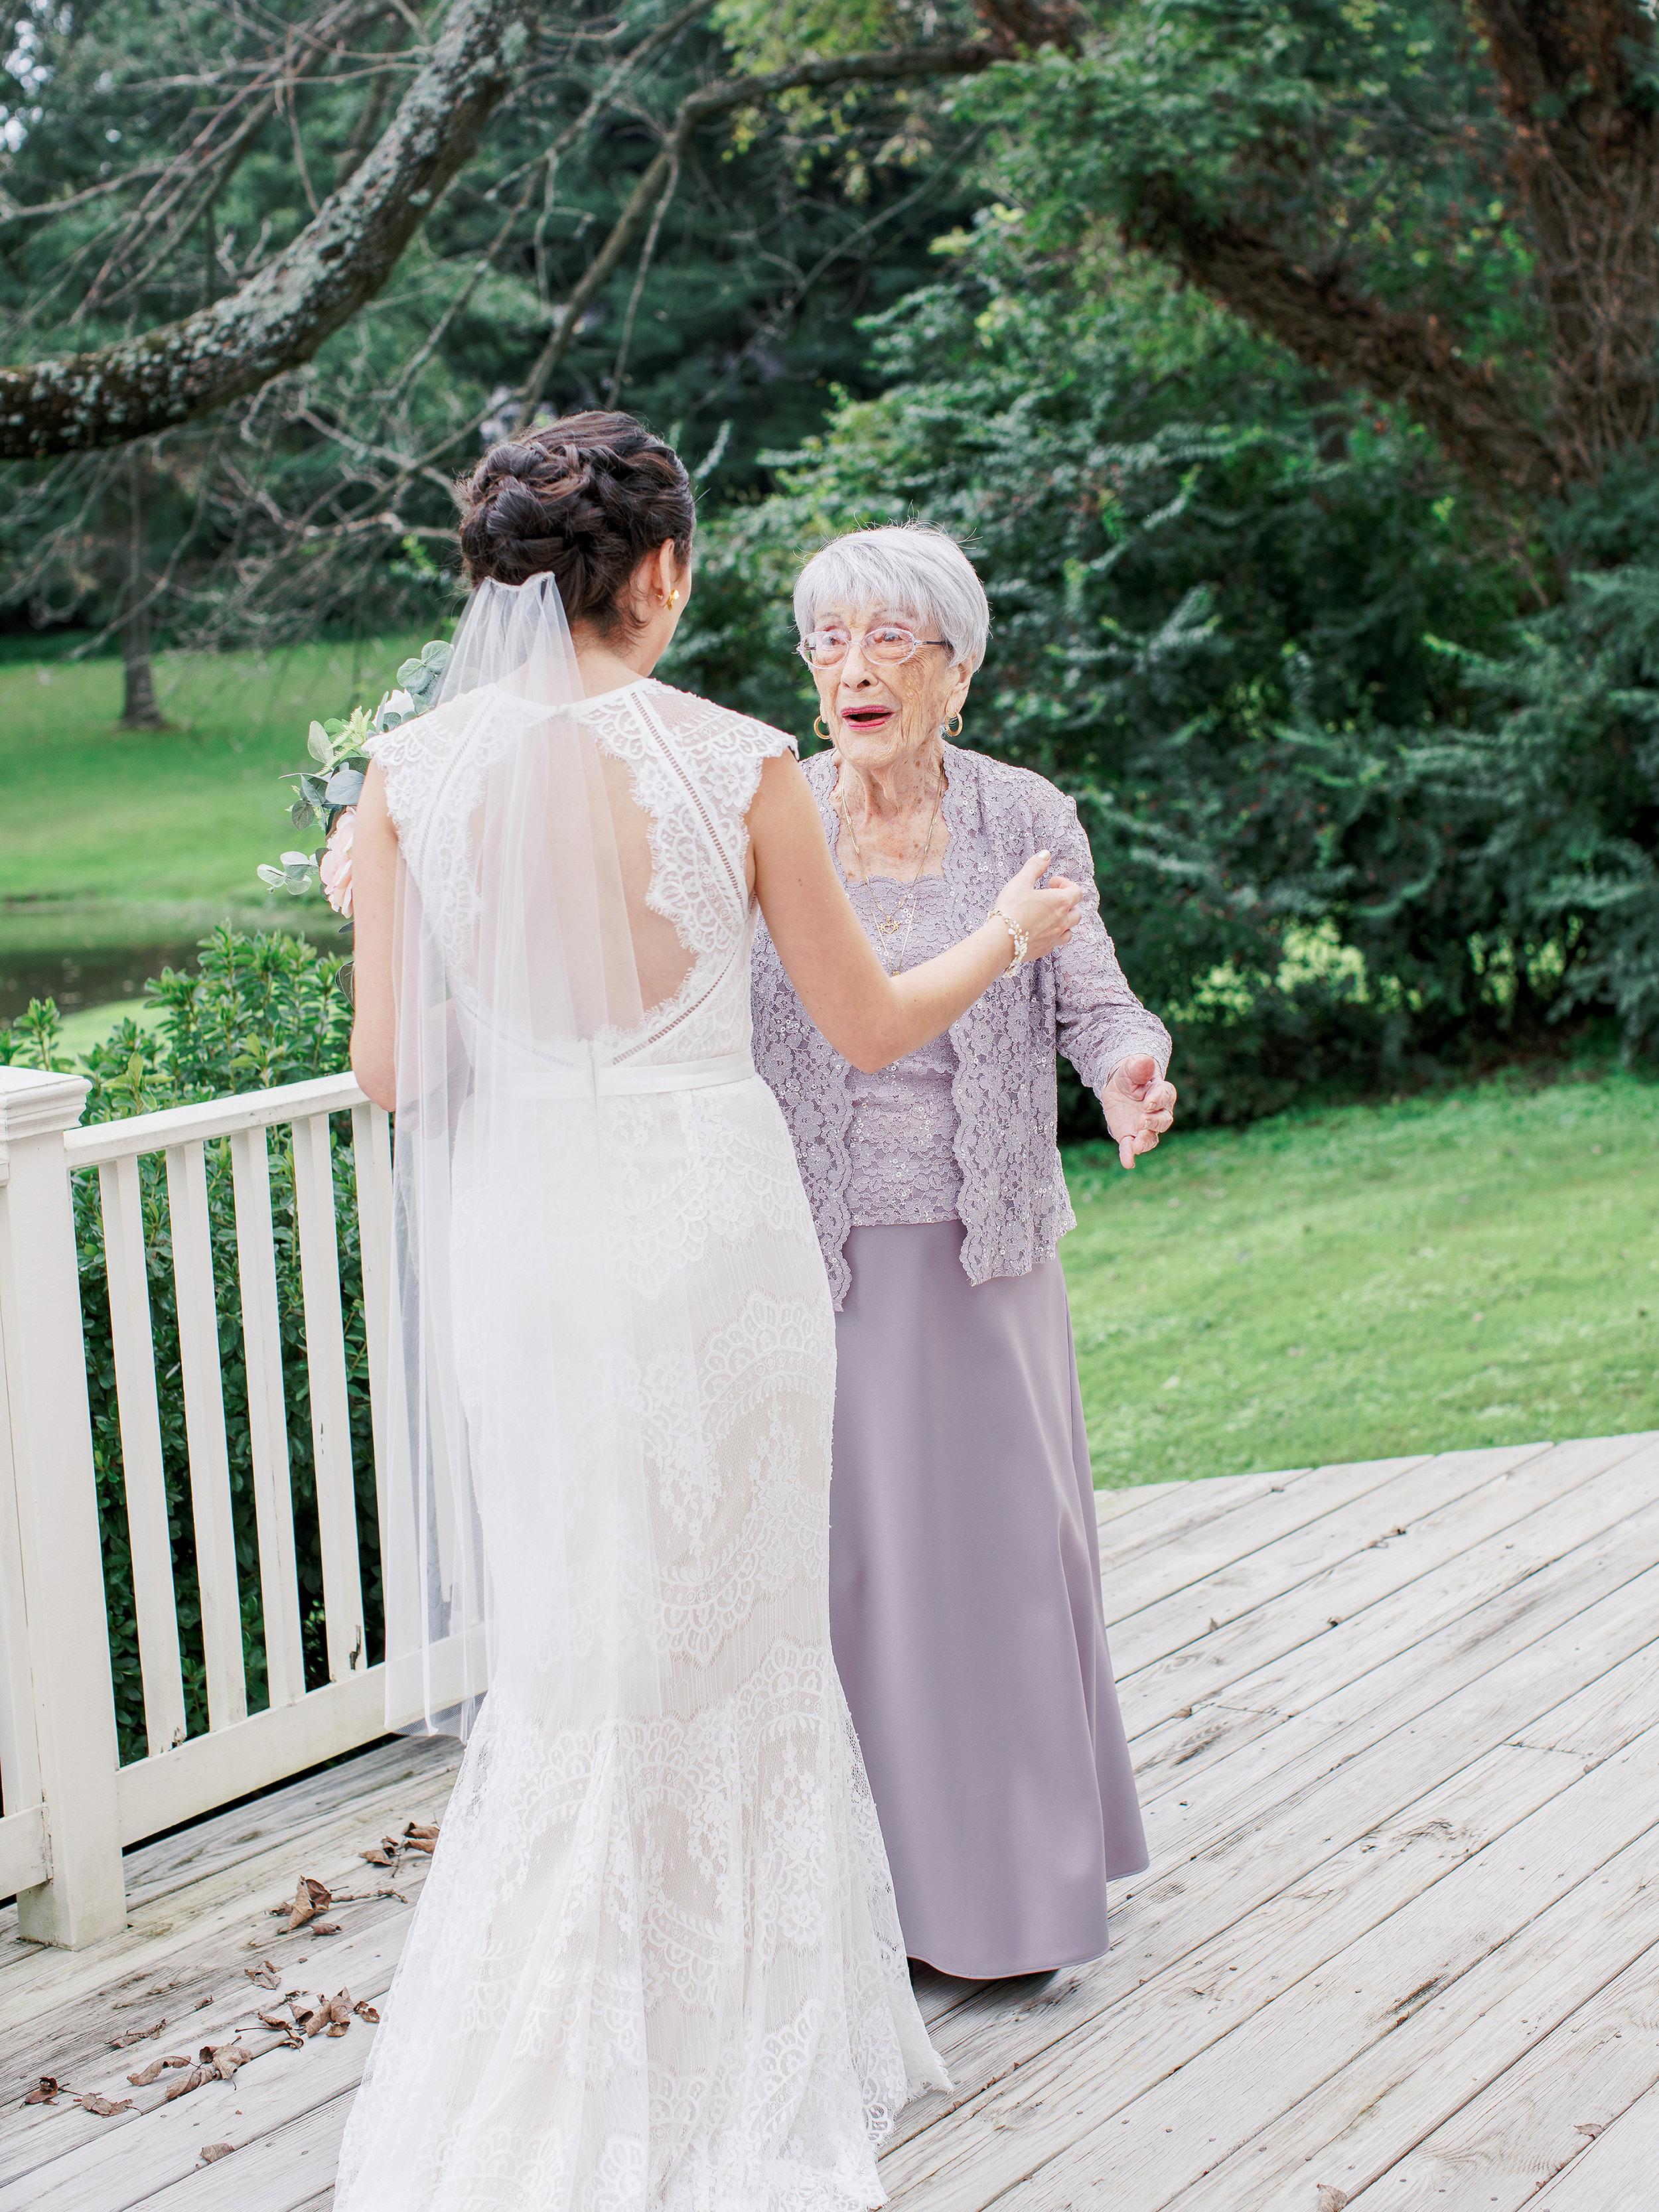 Vicki_Grafton_Photography_wedding-164.jpg